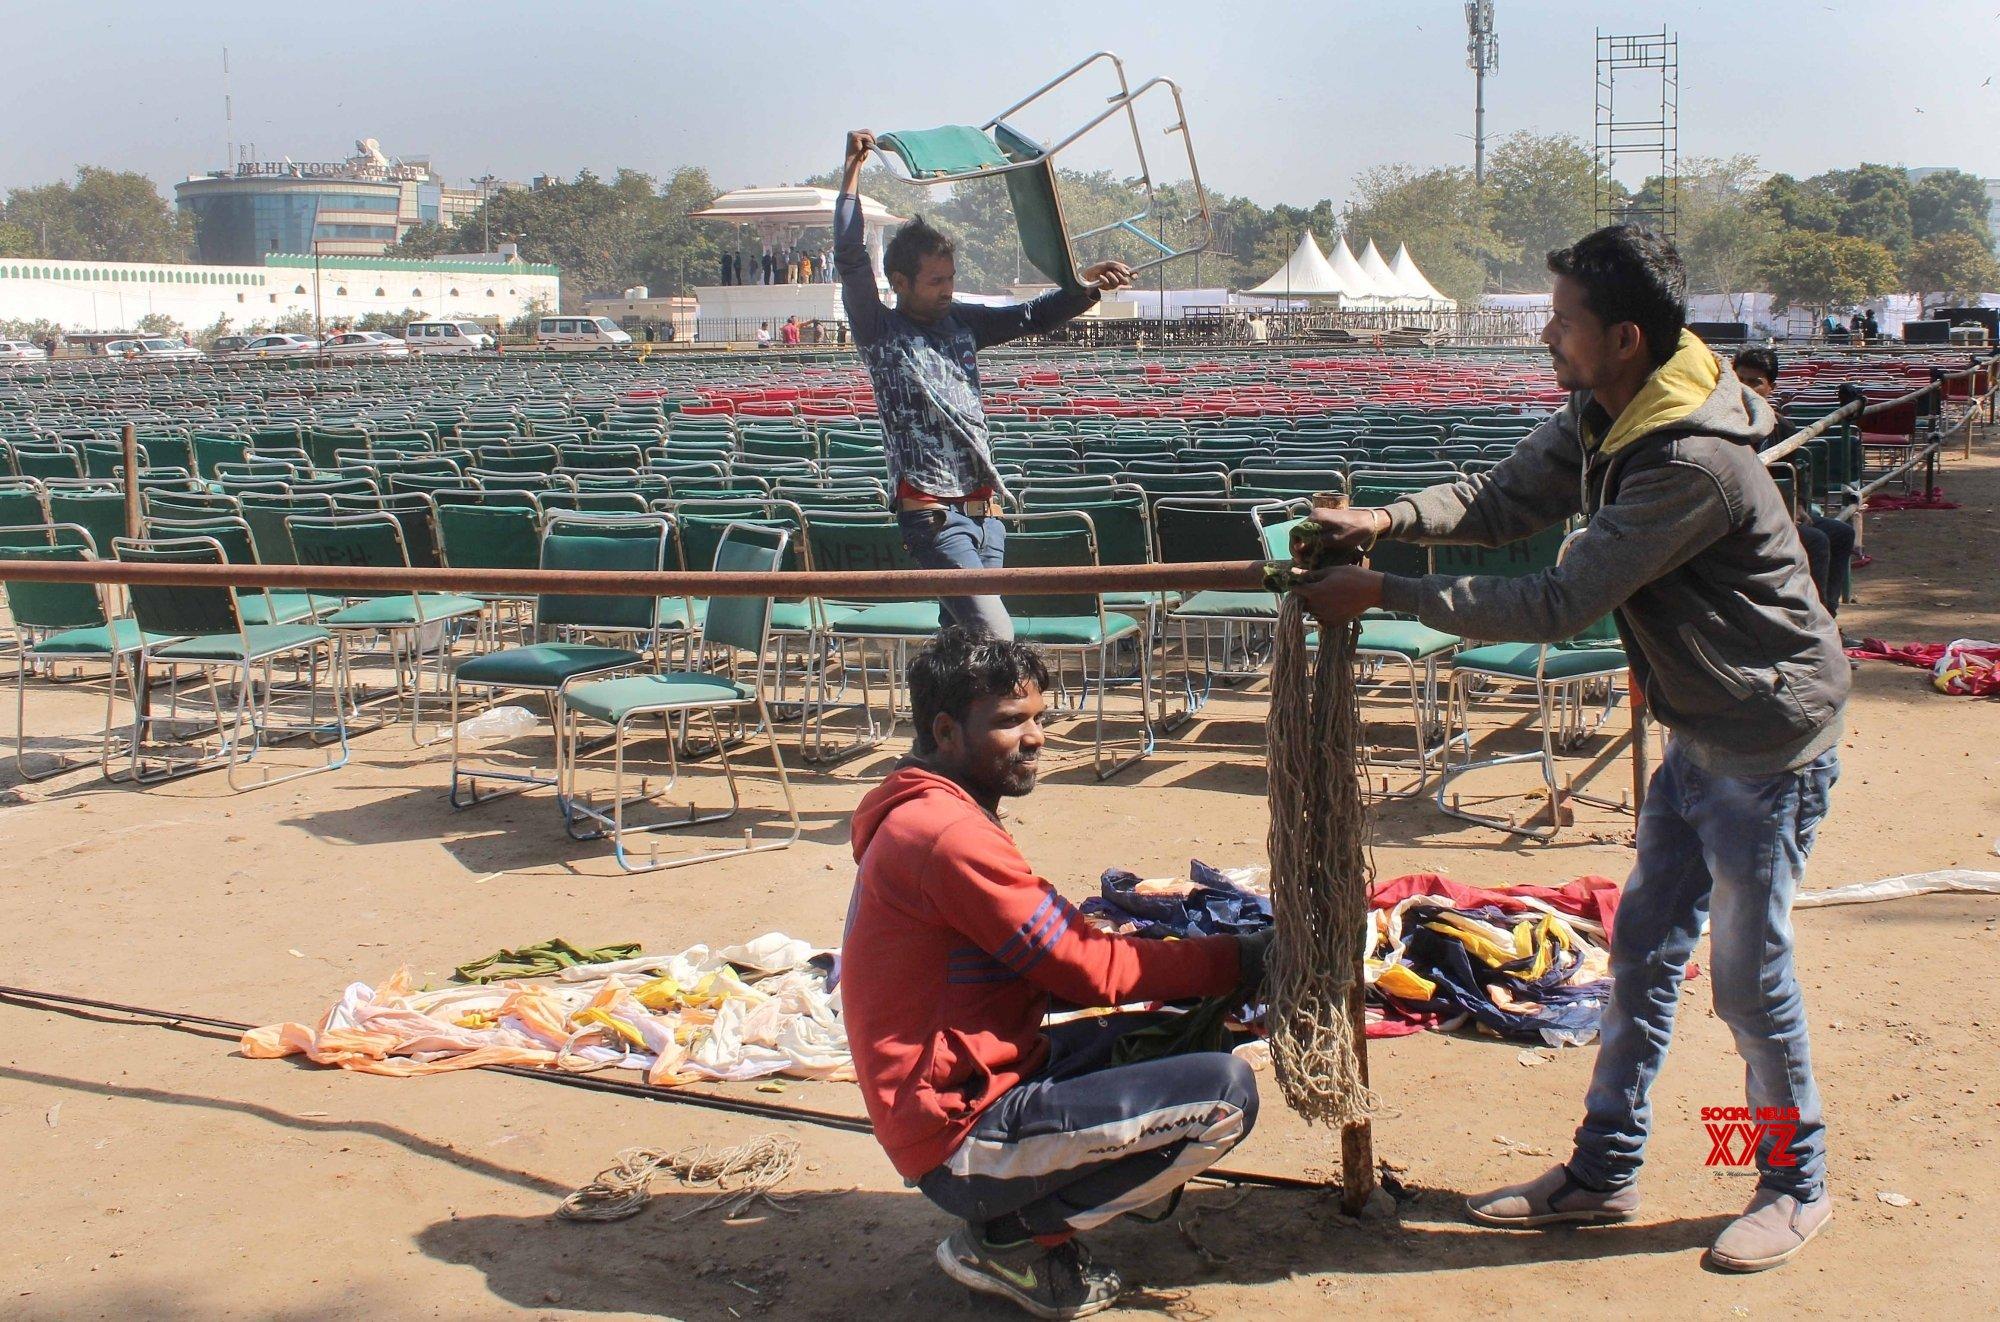 New Delhi: Preparations for Kejriwal's swearing - in ceremony underway at Ramlila Ground #Gallery